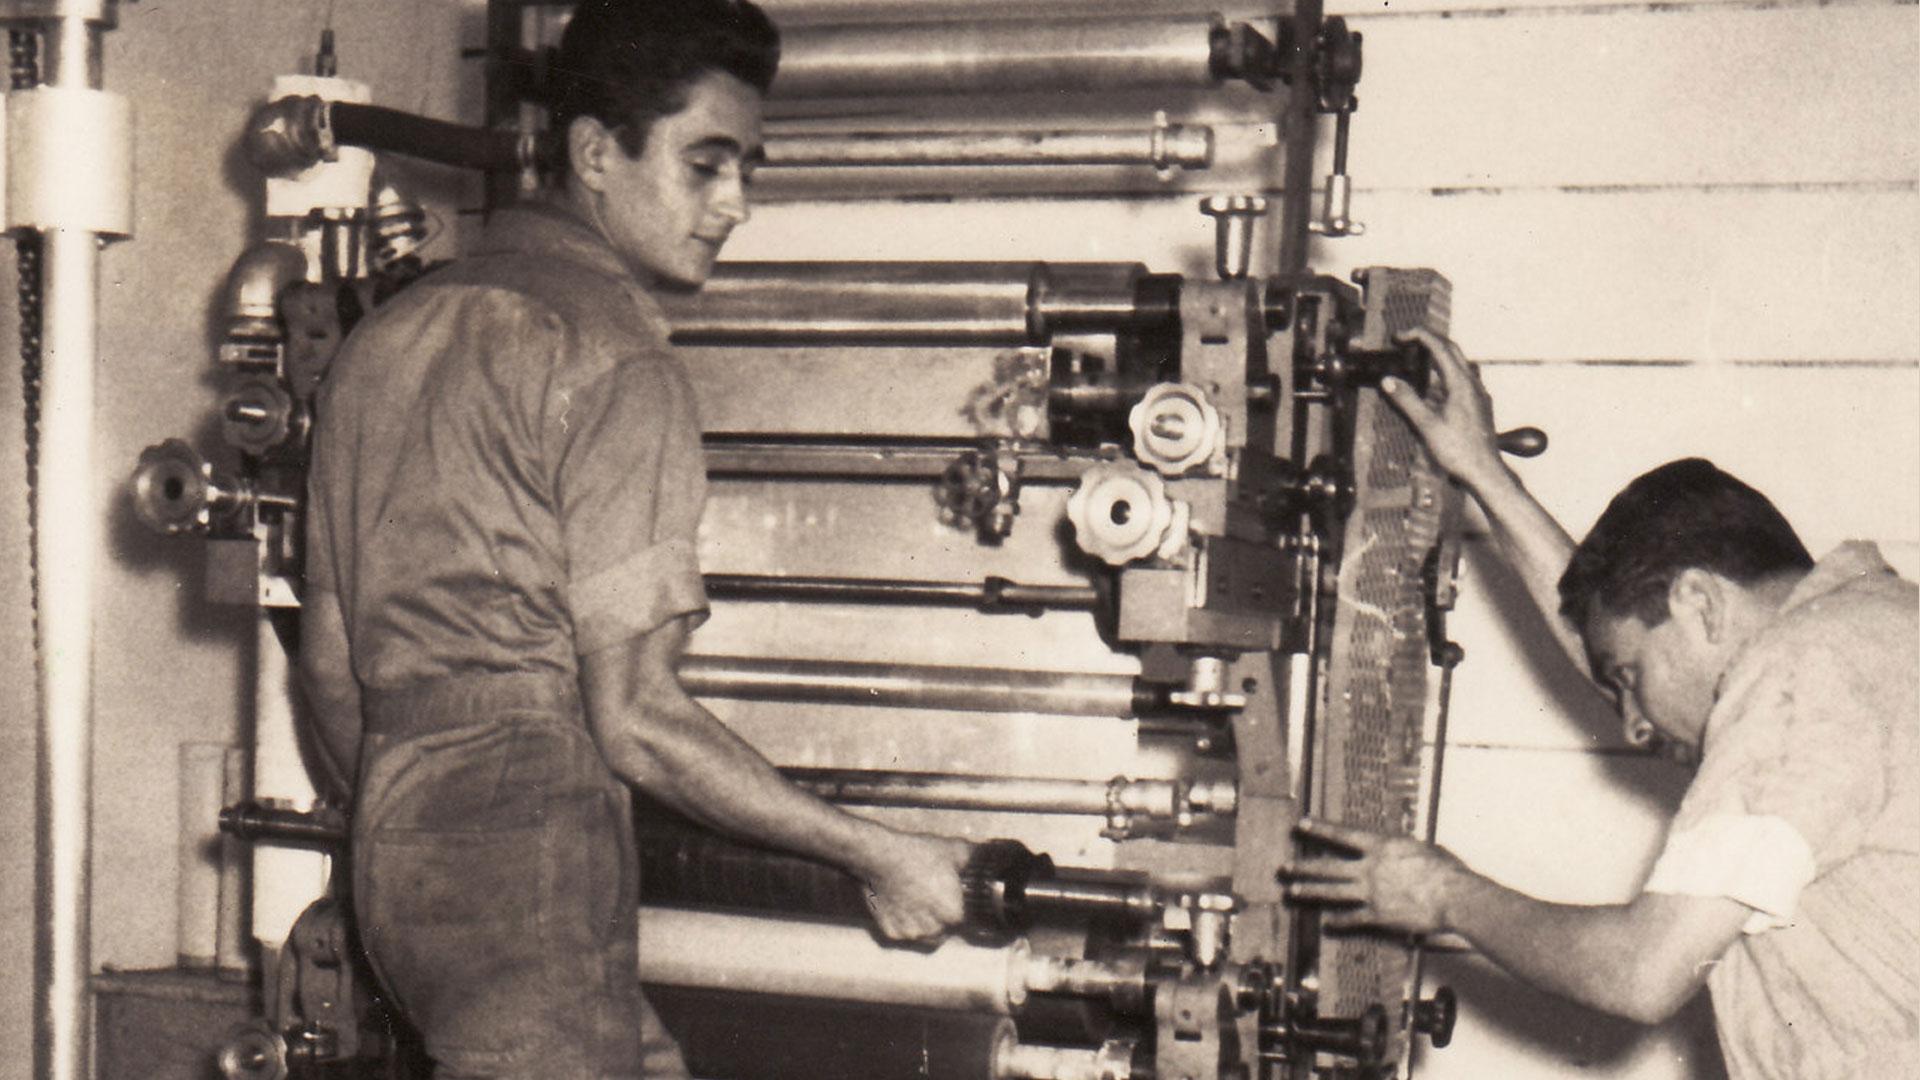 Las primeras impresoras de la historia